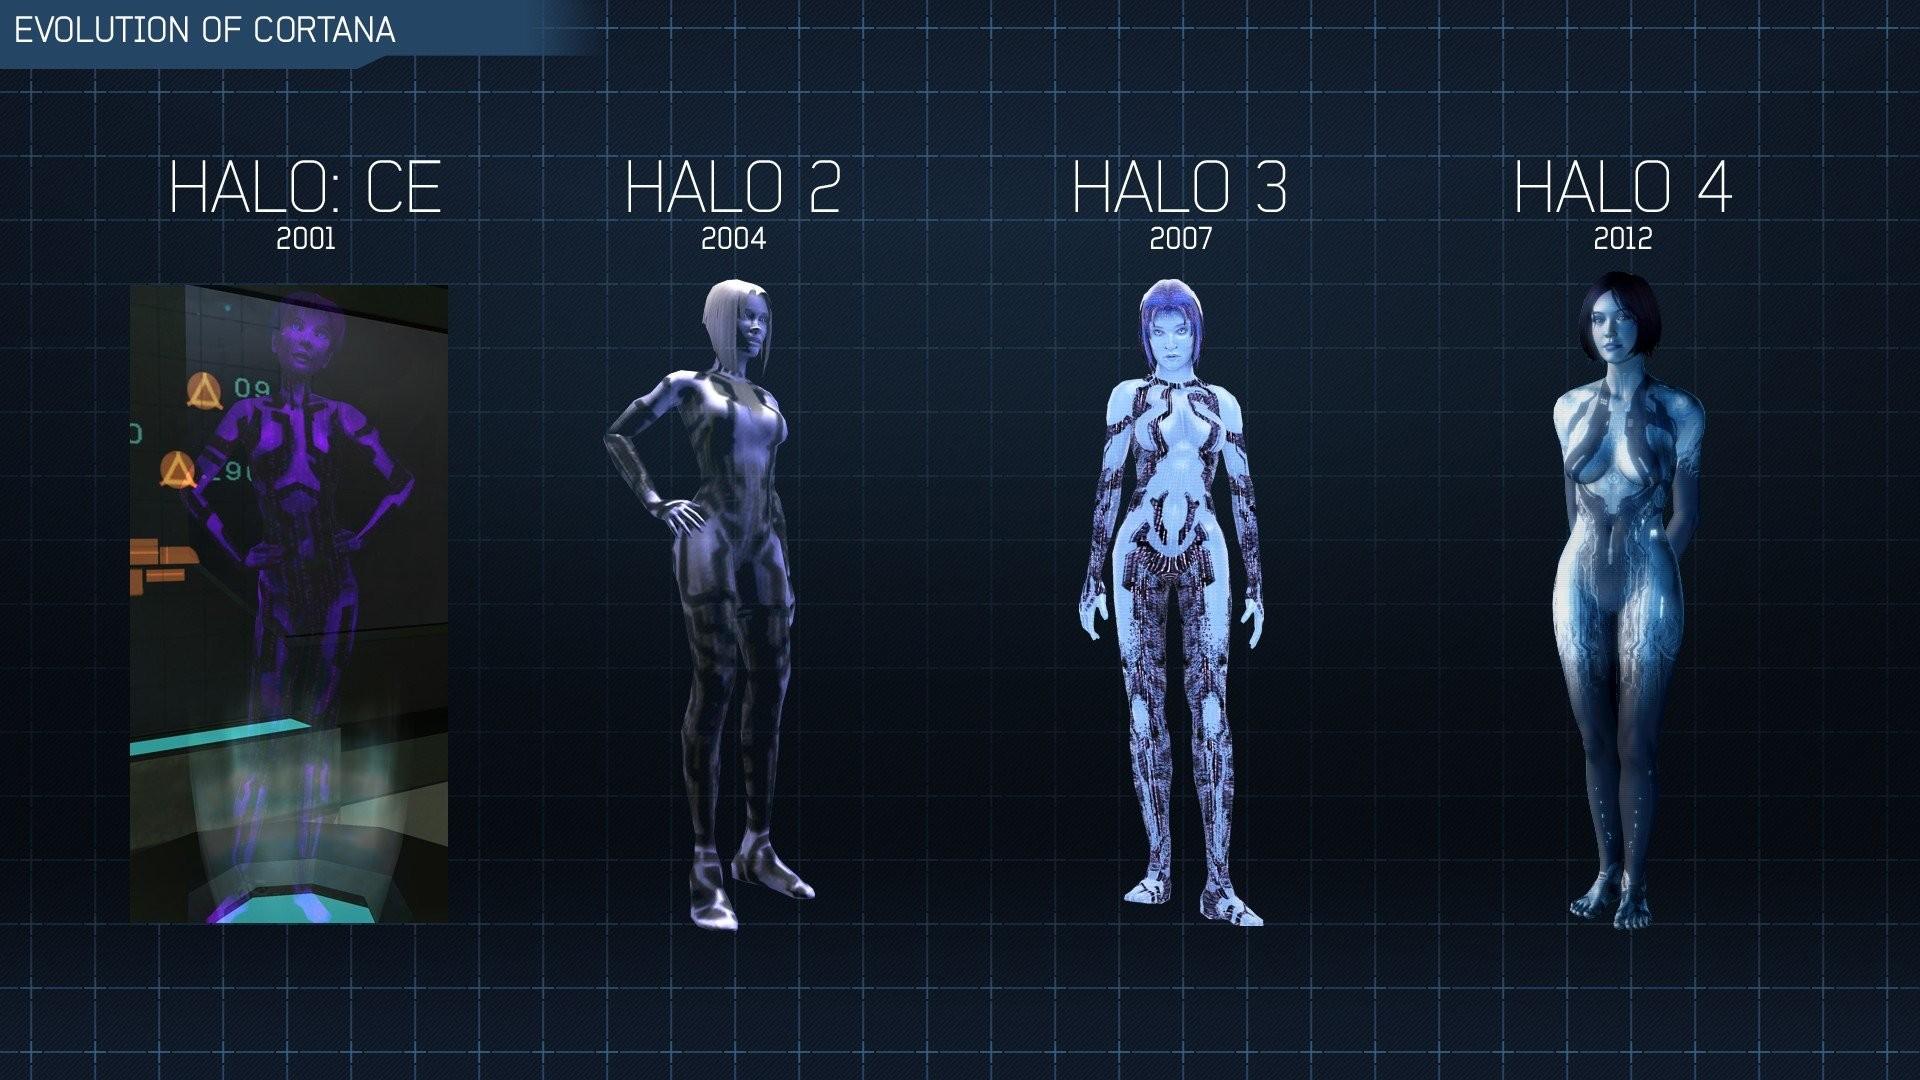 evolution Halo 4 Halo 2 wallpaper | | 303257 | WallpaperUP .